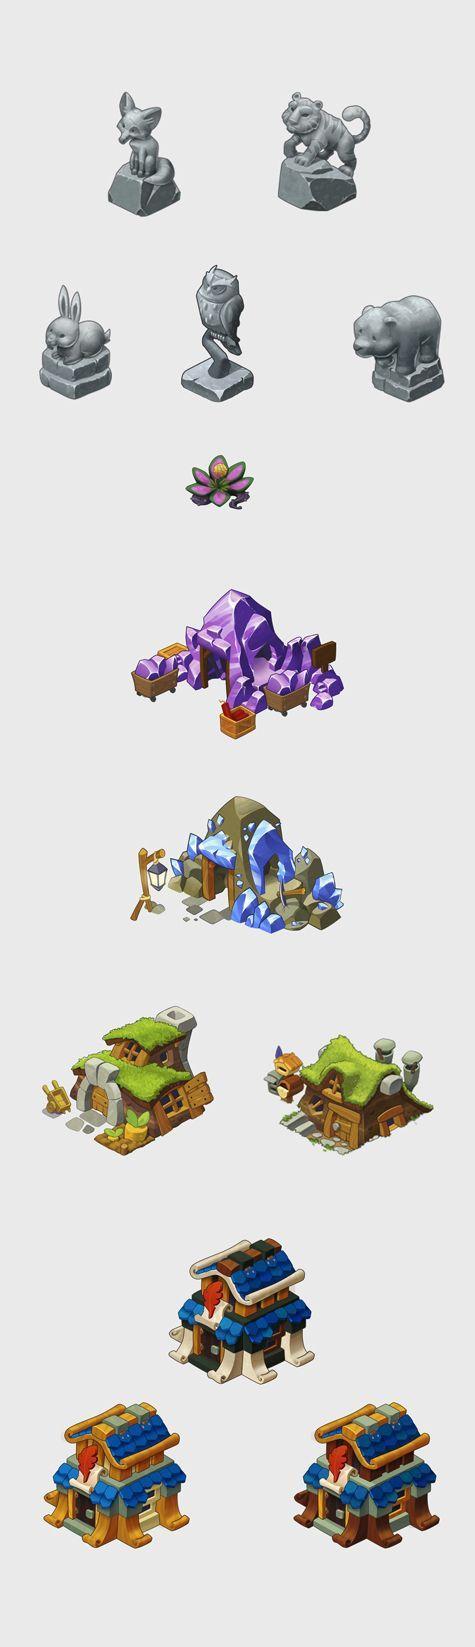 game build